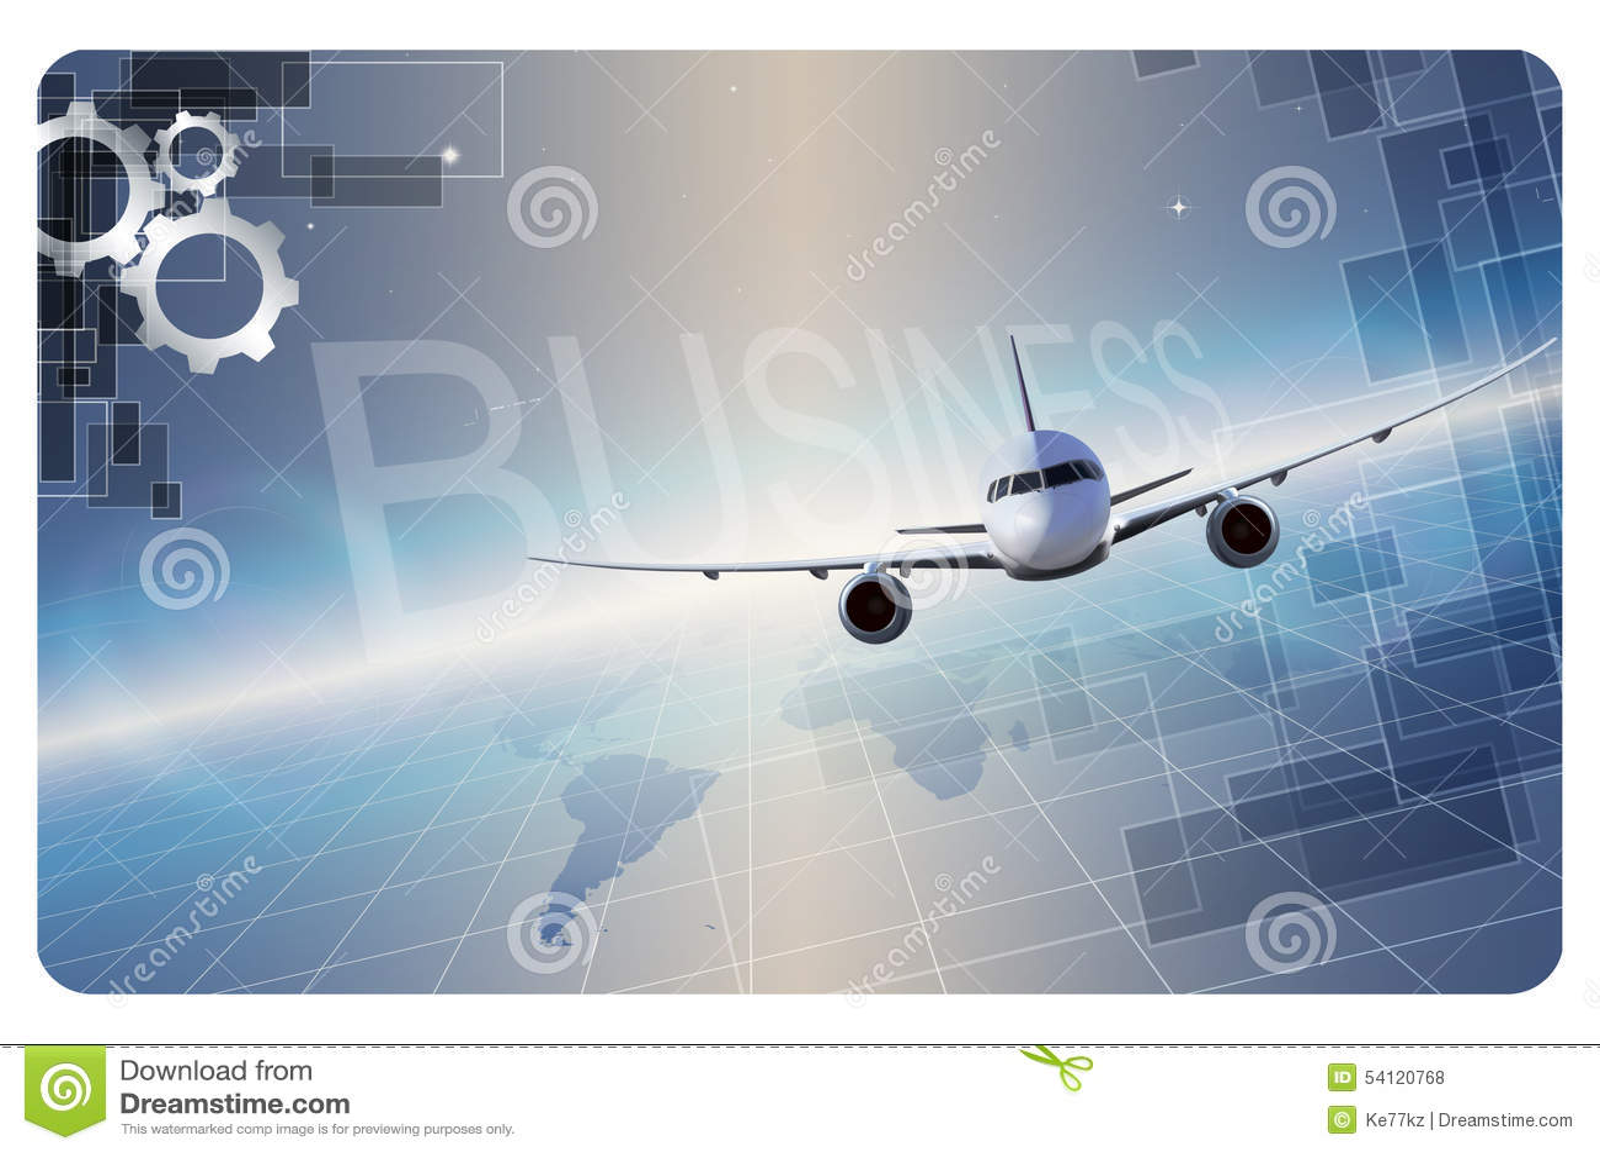 Business card template. stock illustration. Illustration of ...